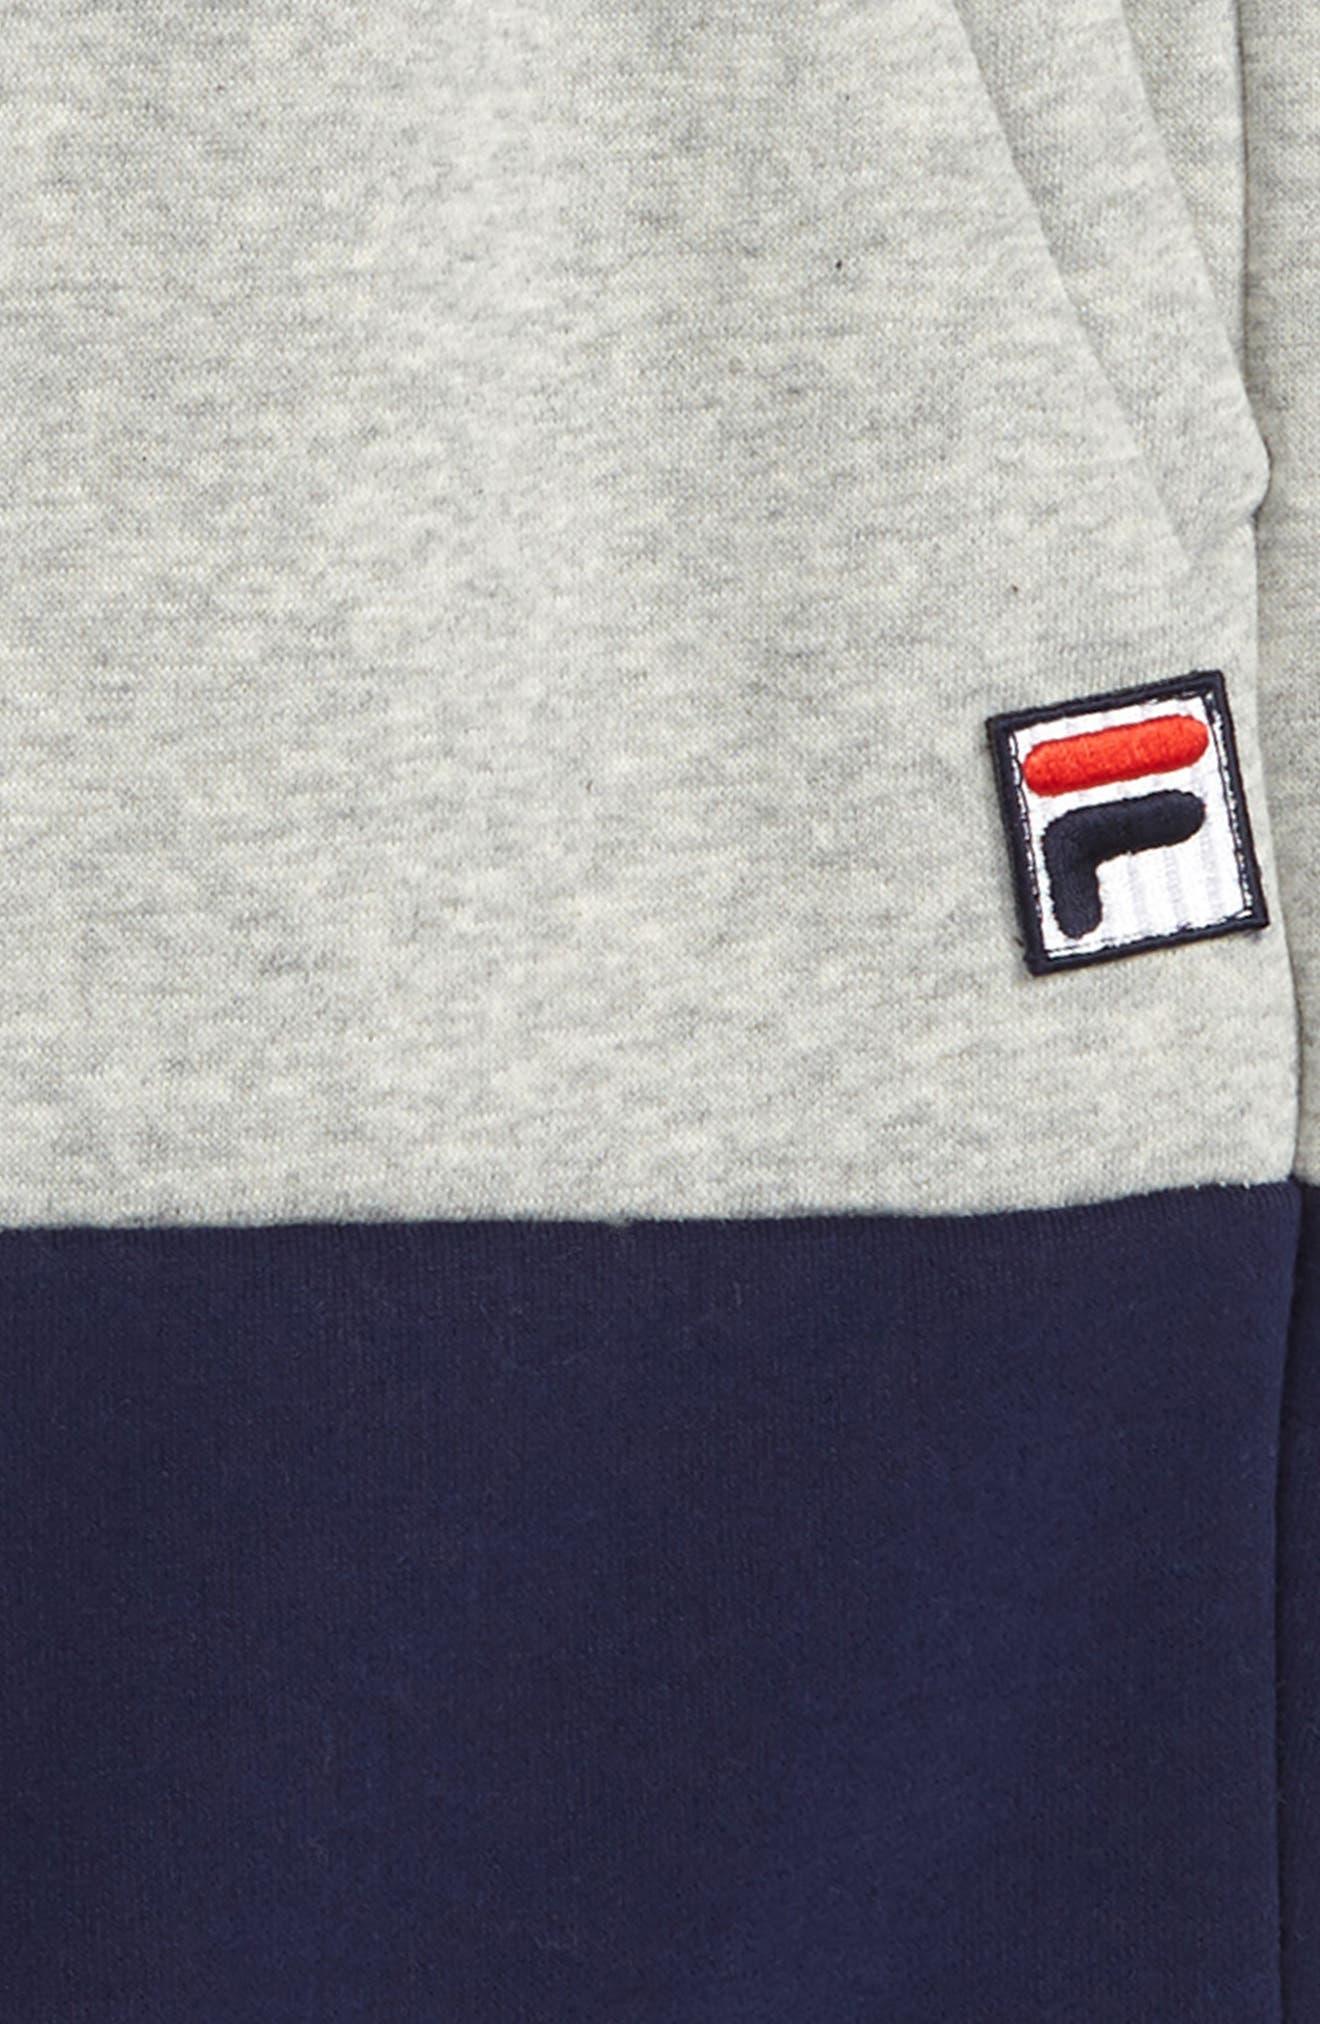 Colorblock Sweat Shorts,                             Alternate thumbnail 2, color,                             050